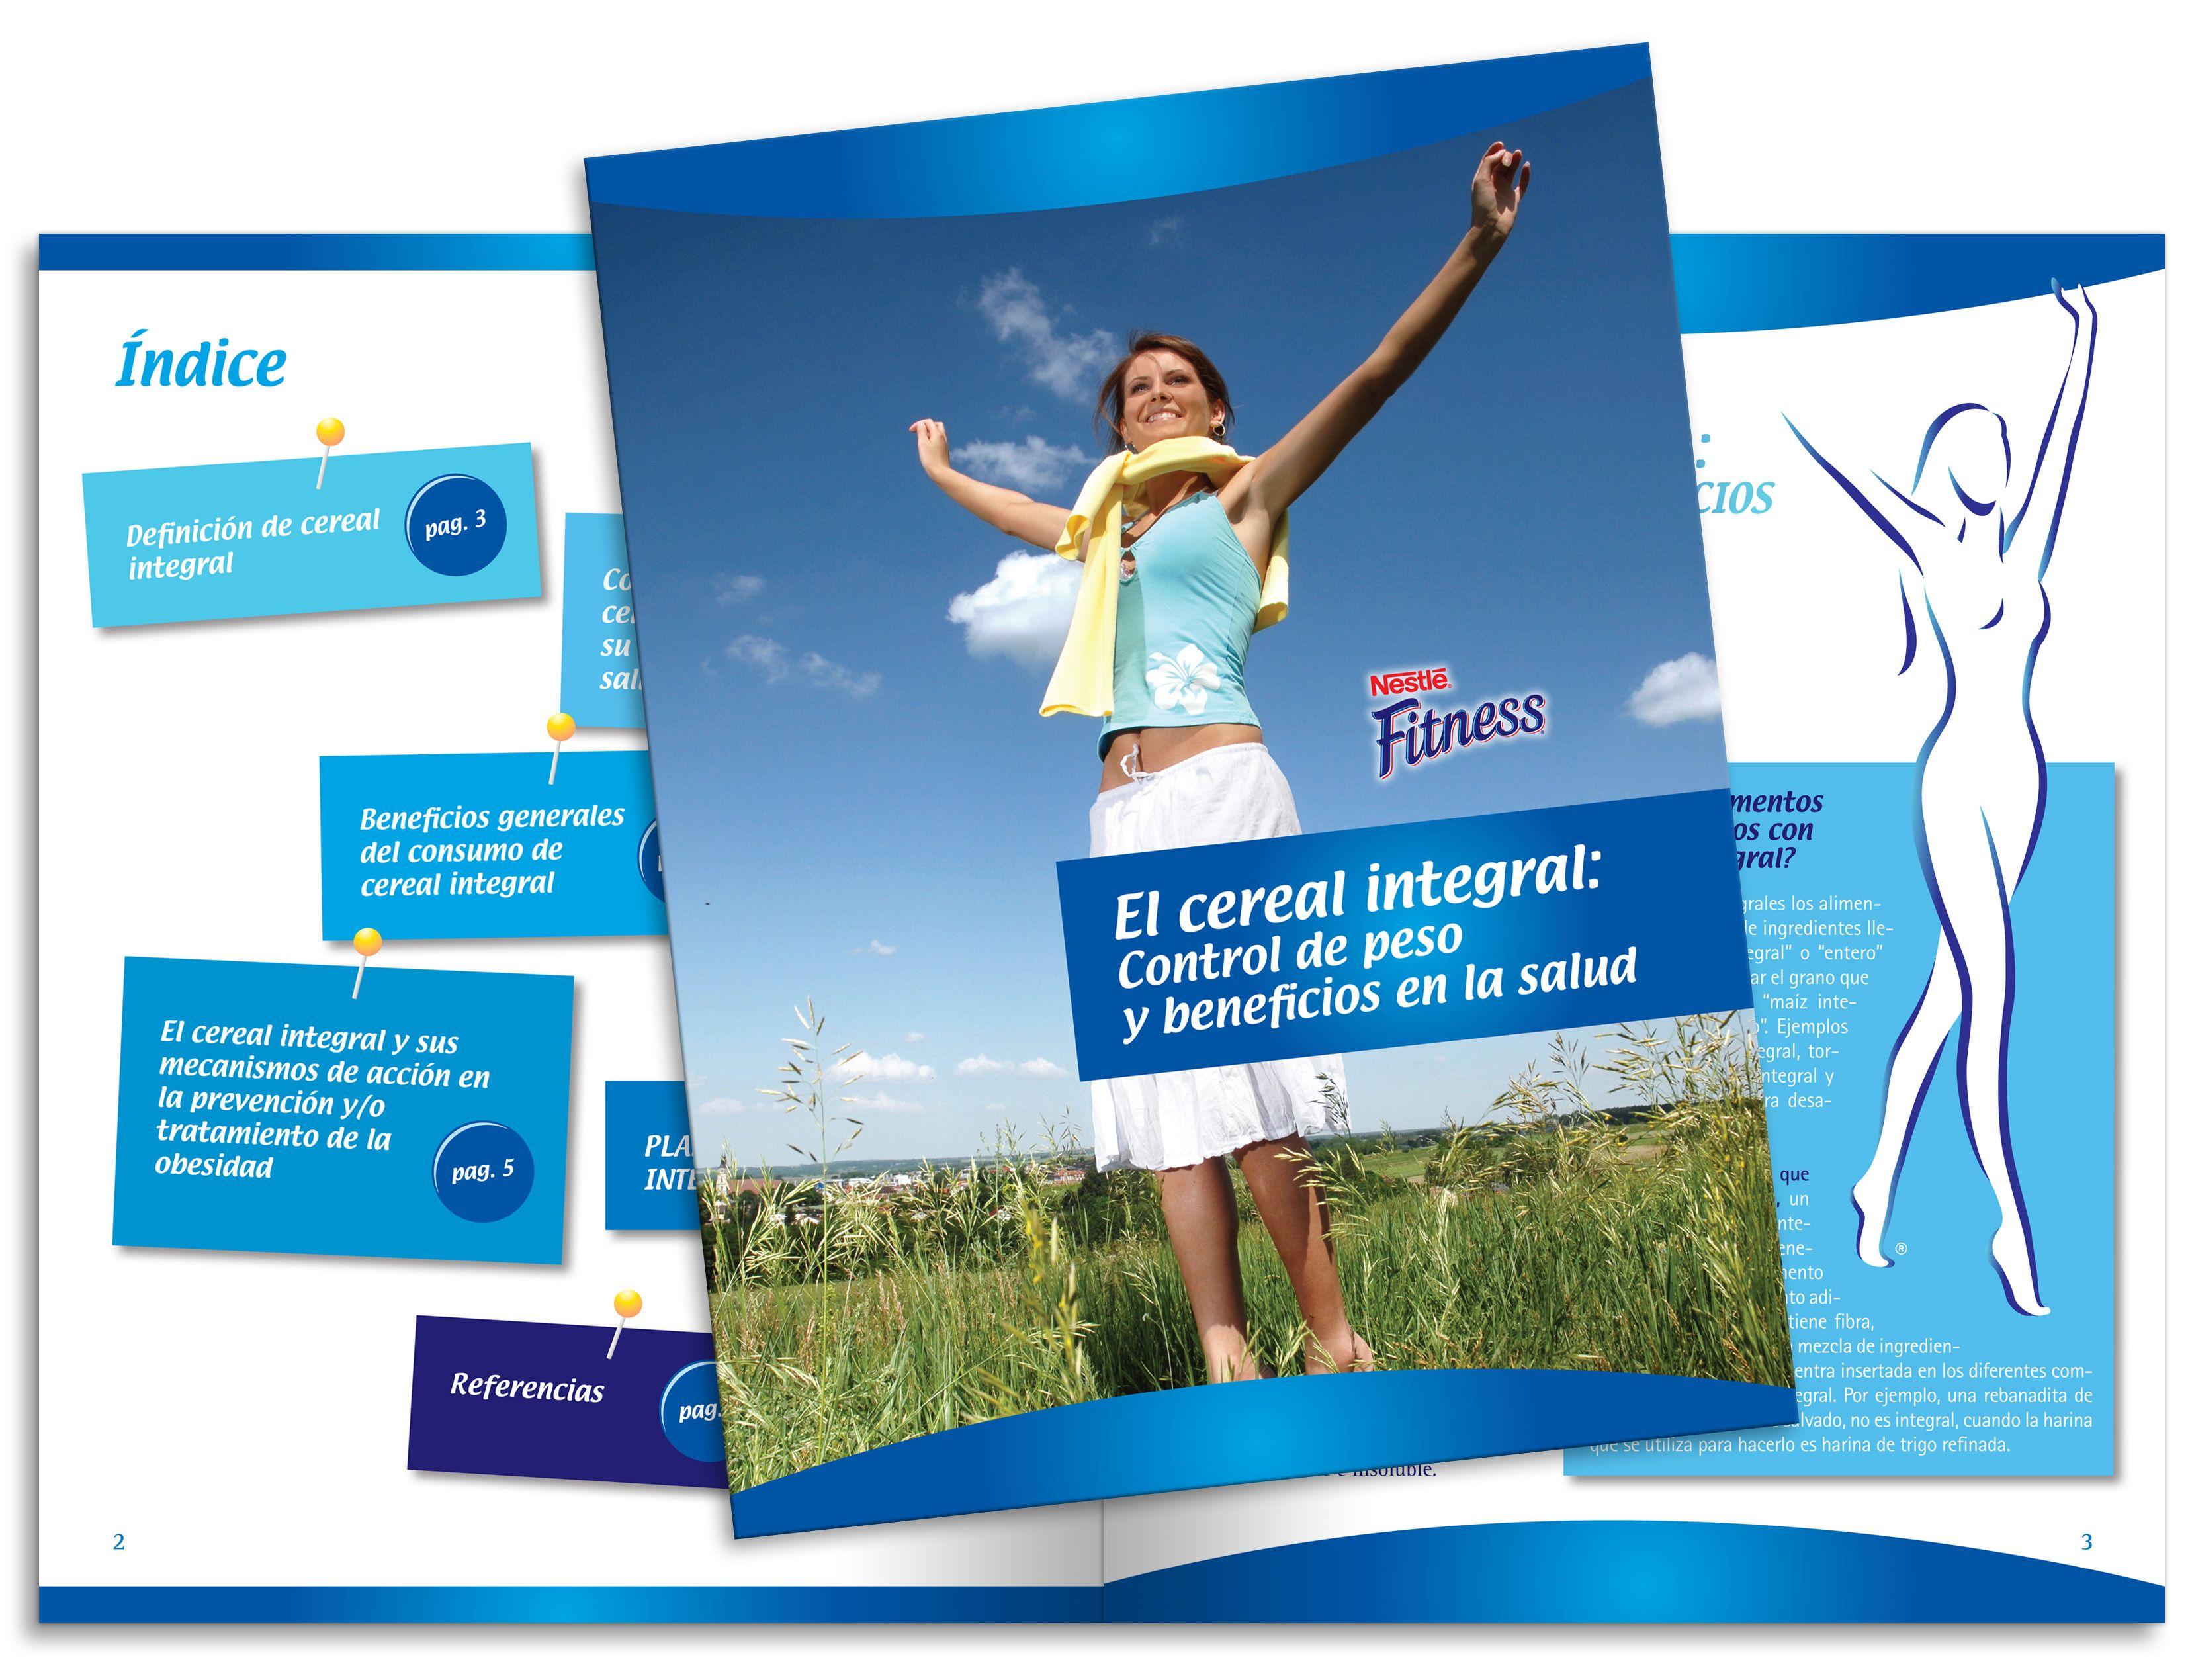 Diseño publicitario/editorial - Stop Diseño Gráfico - Diseño de Dossier Fitness 1 - Cereal Partners Worldwide - Nestlé México.